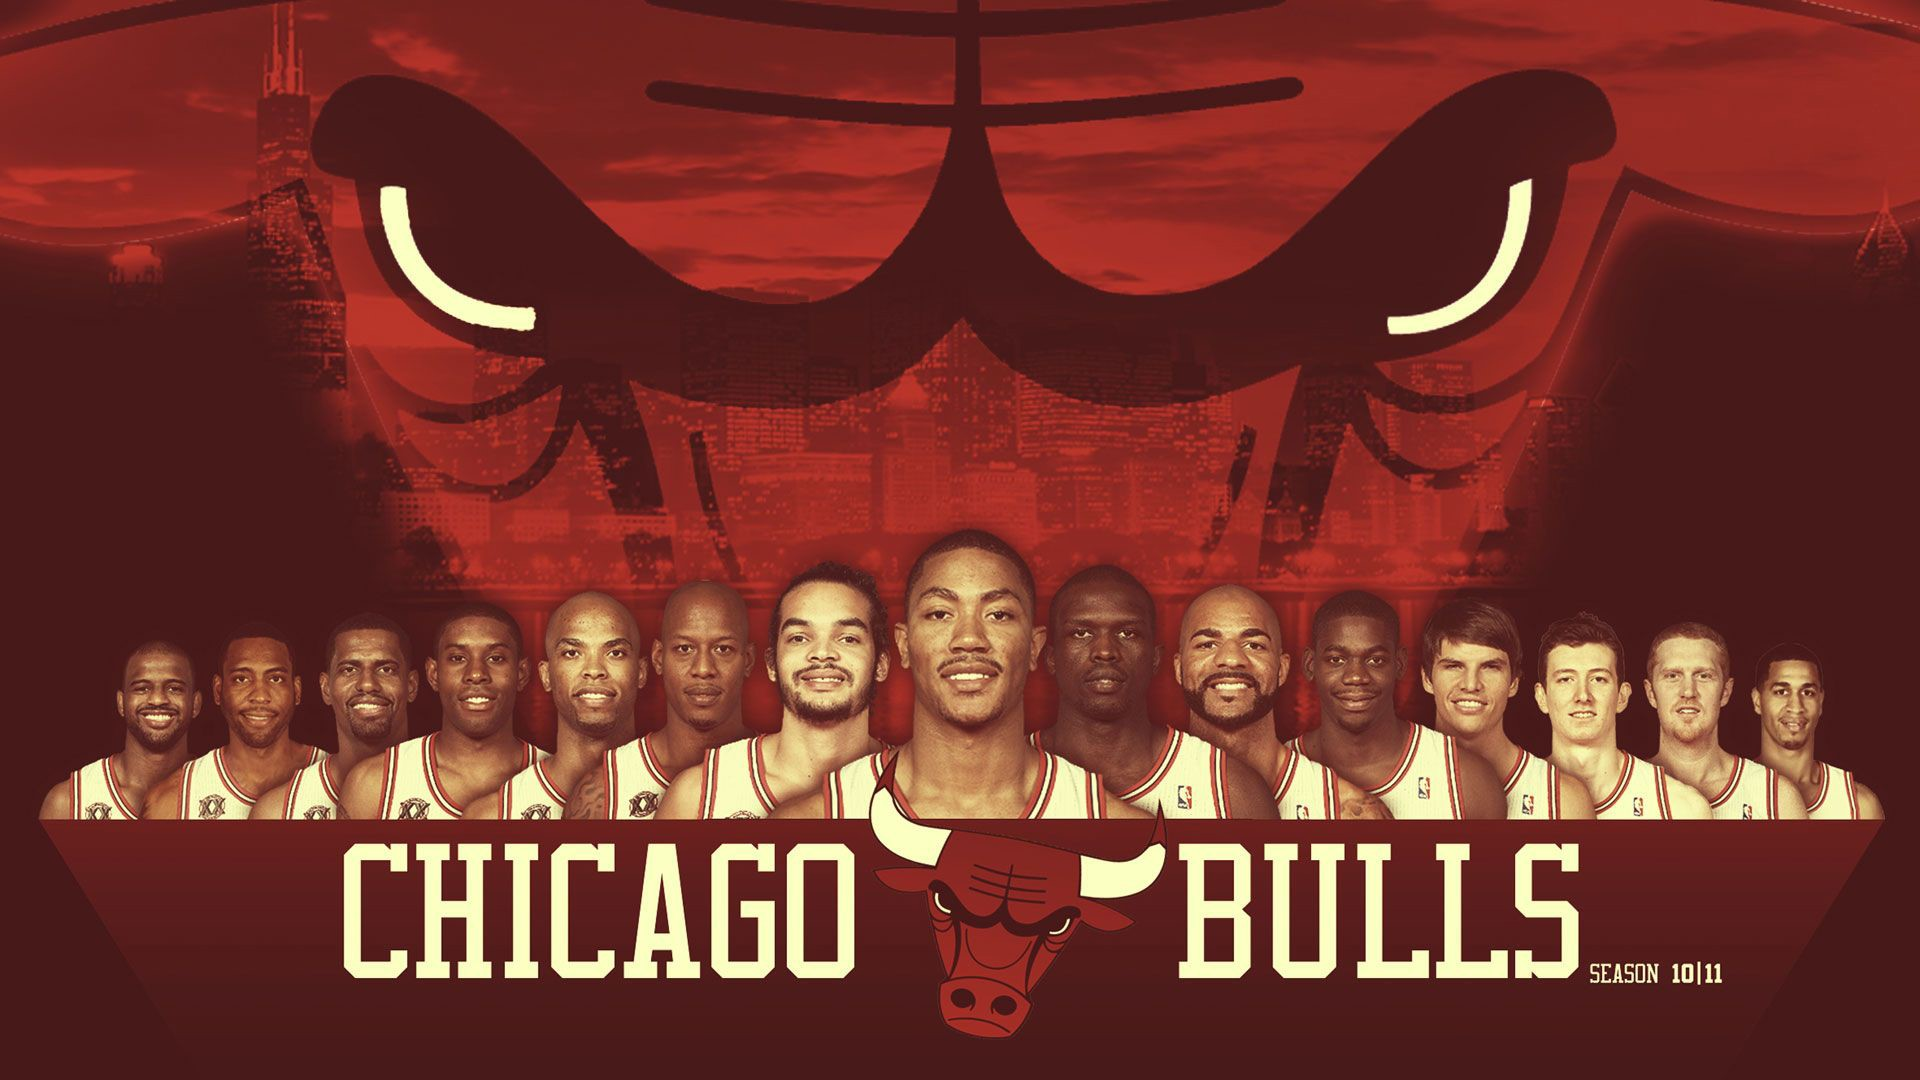 Chicago Bulls Wallpapers 2